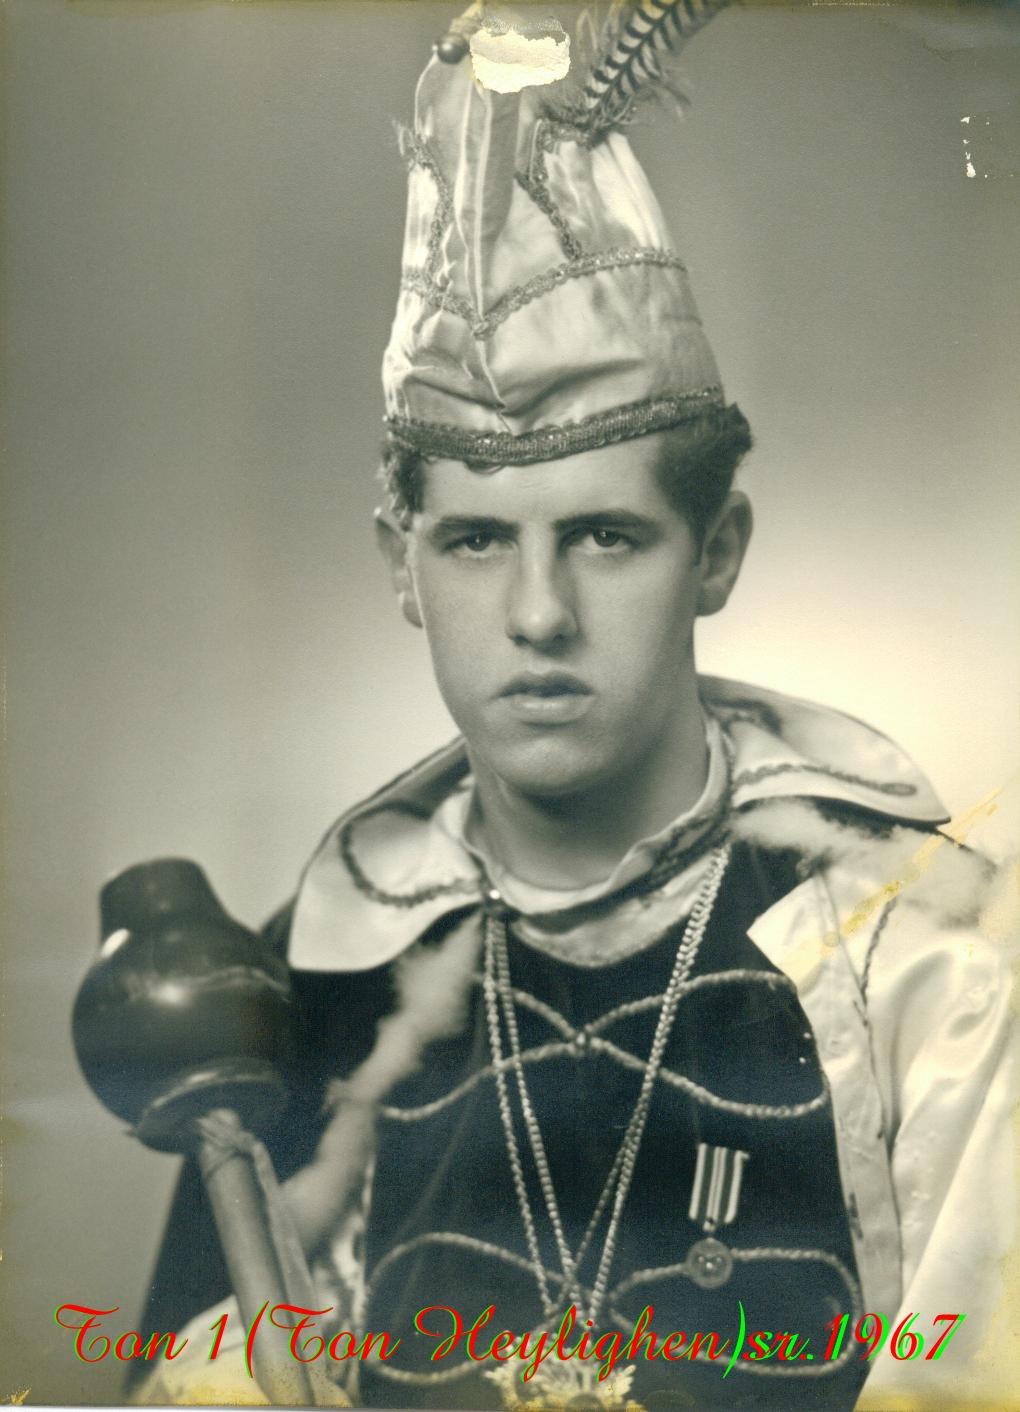 1967 Prins Ton (I) Heylighen